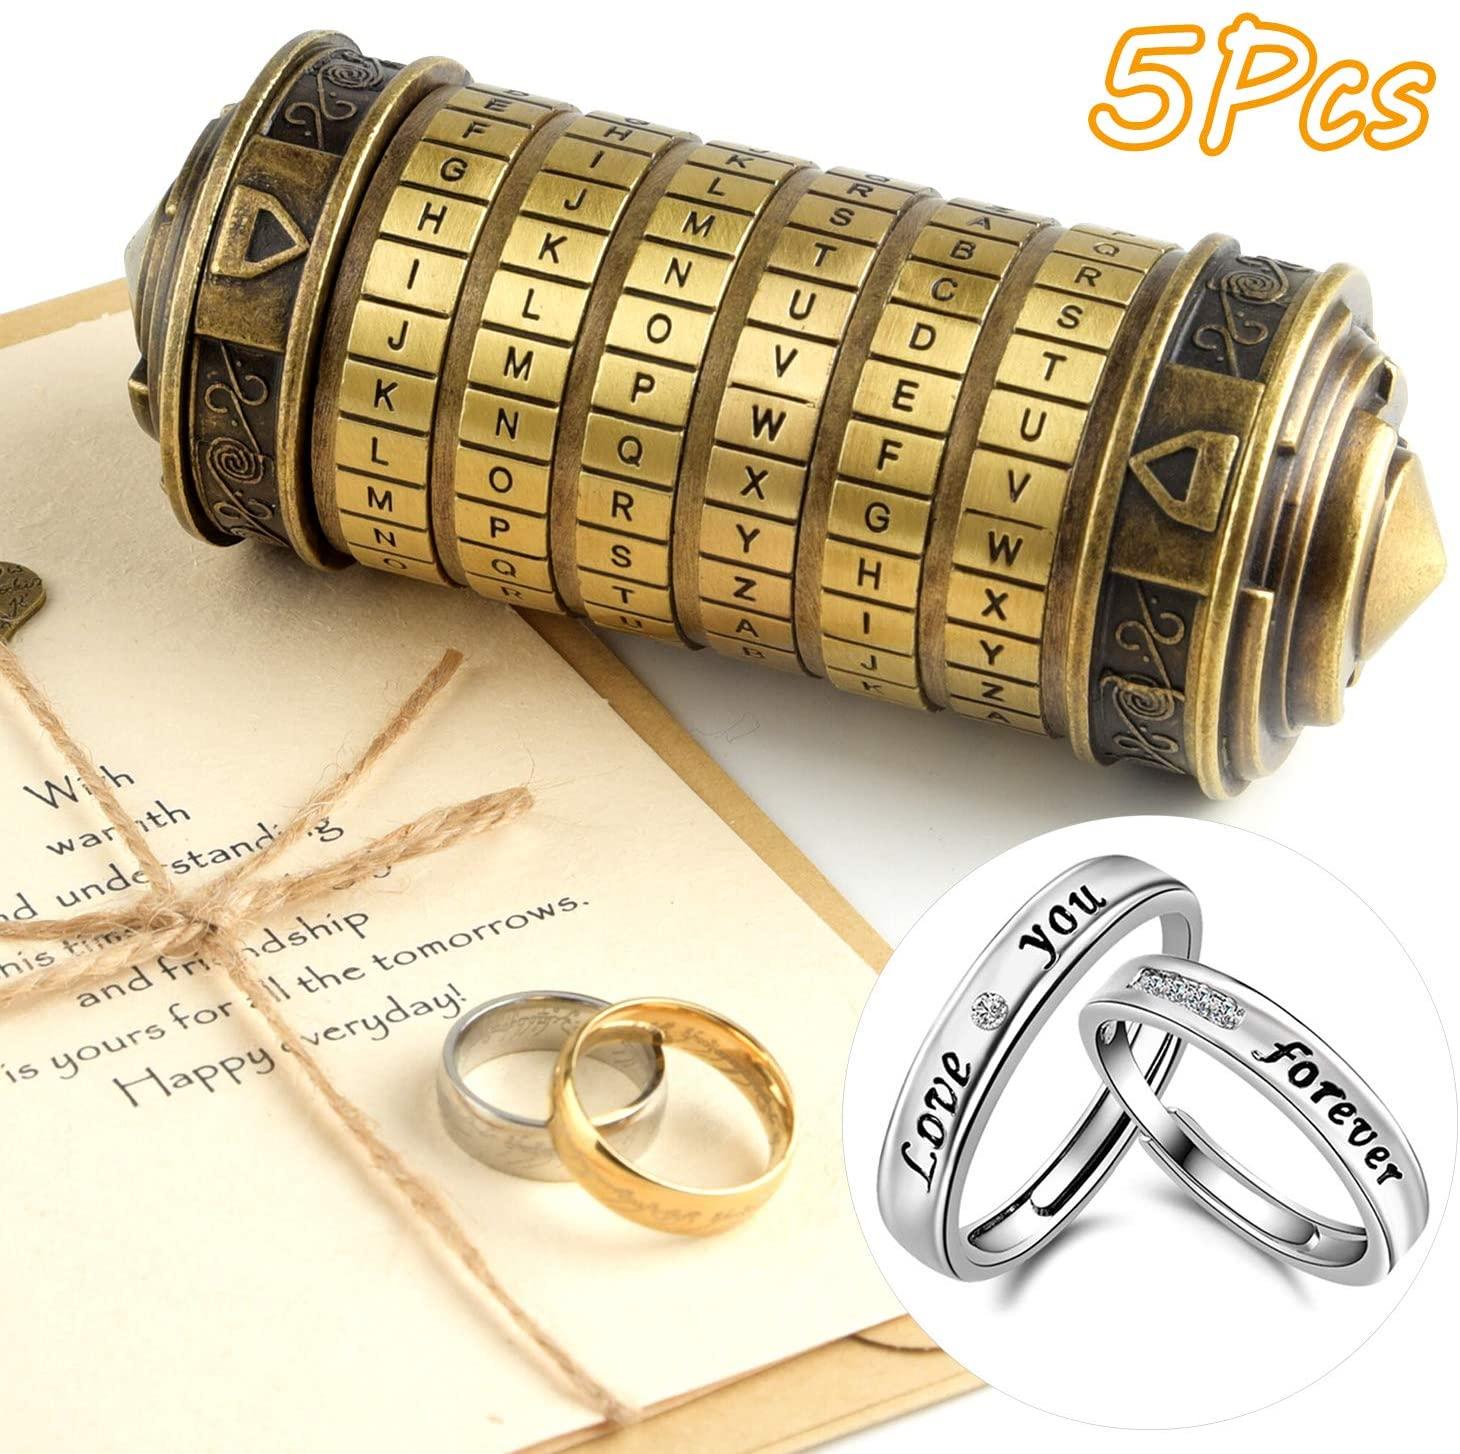 TUPARKA 5 Pieces Da Vinci Code Mini Cryptex Puzzle Boxes Valentine's Day Interesting Creative Romantic Secret Box Birthday Gifts for Women Her